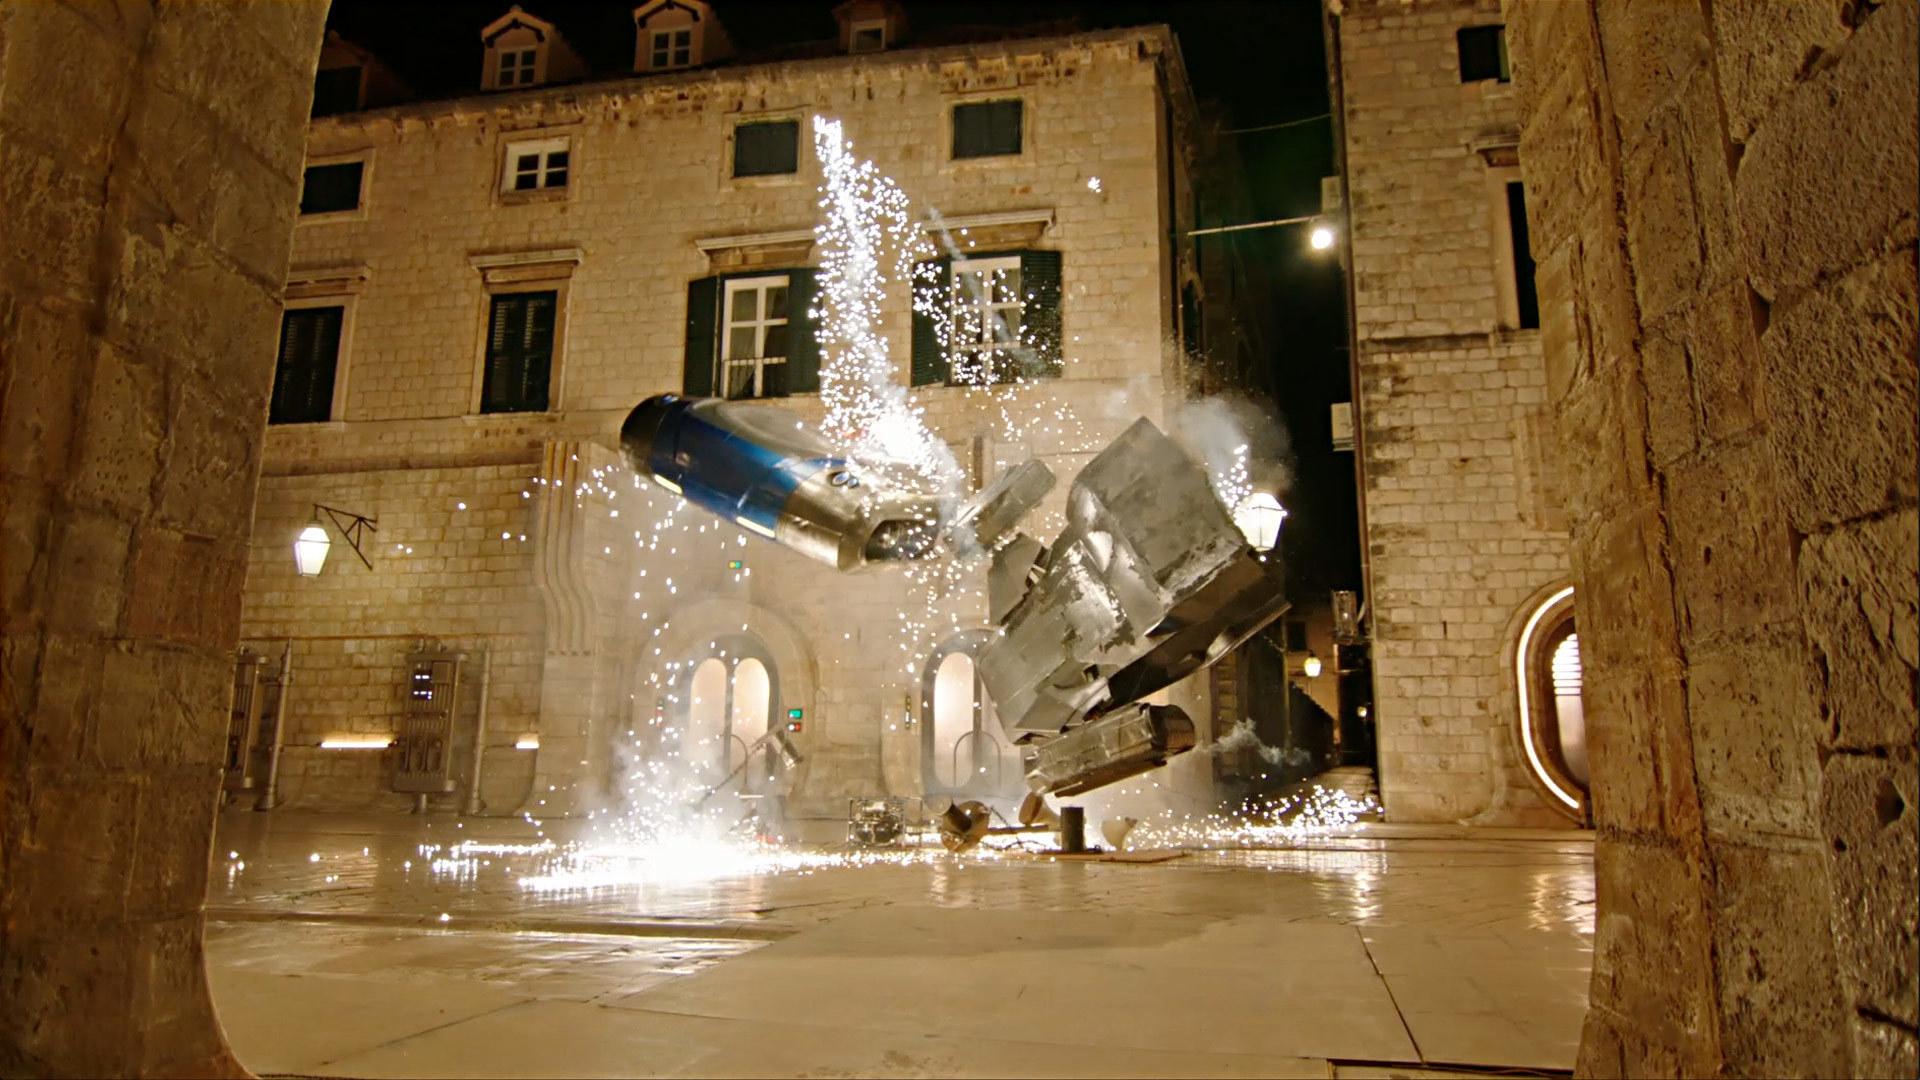 canto-bight-explosion.jpeg